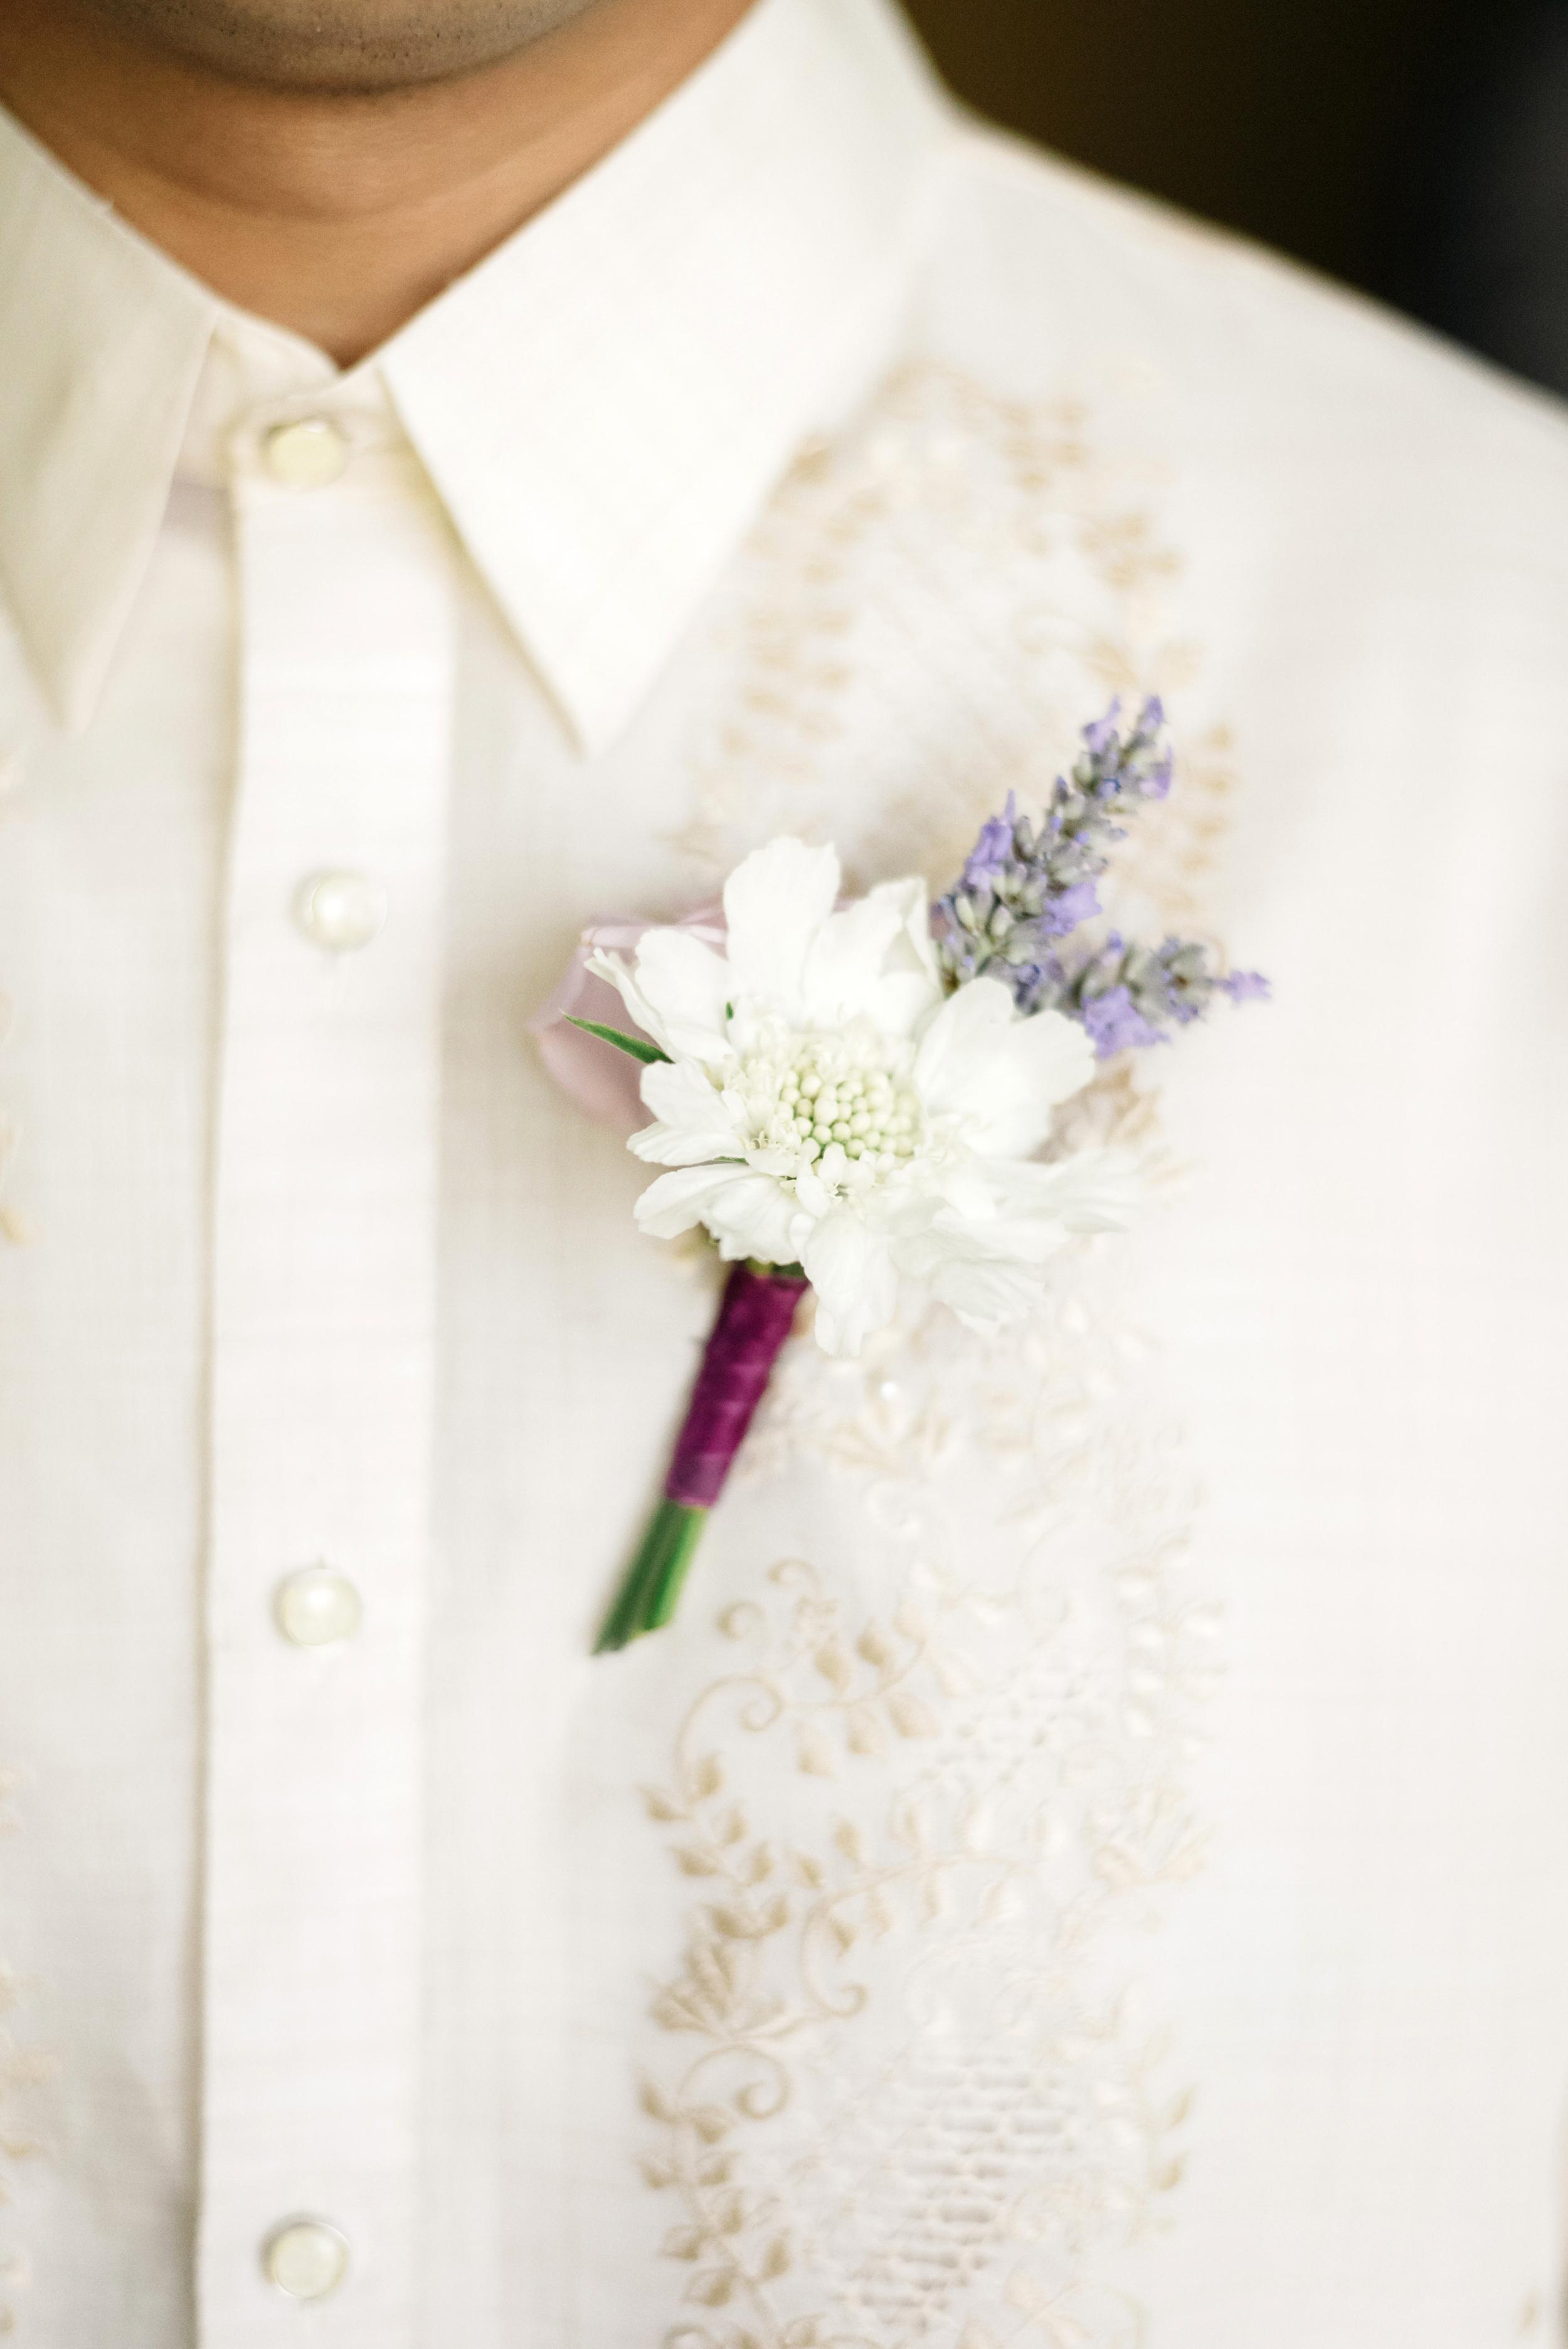 White Wedding Boutonniere | Joe and Patience Photography | Filipino Wedding Planner | Seattle Wedding Planner | Ballard Bay Club Wedding